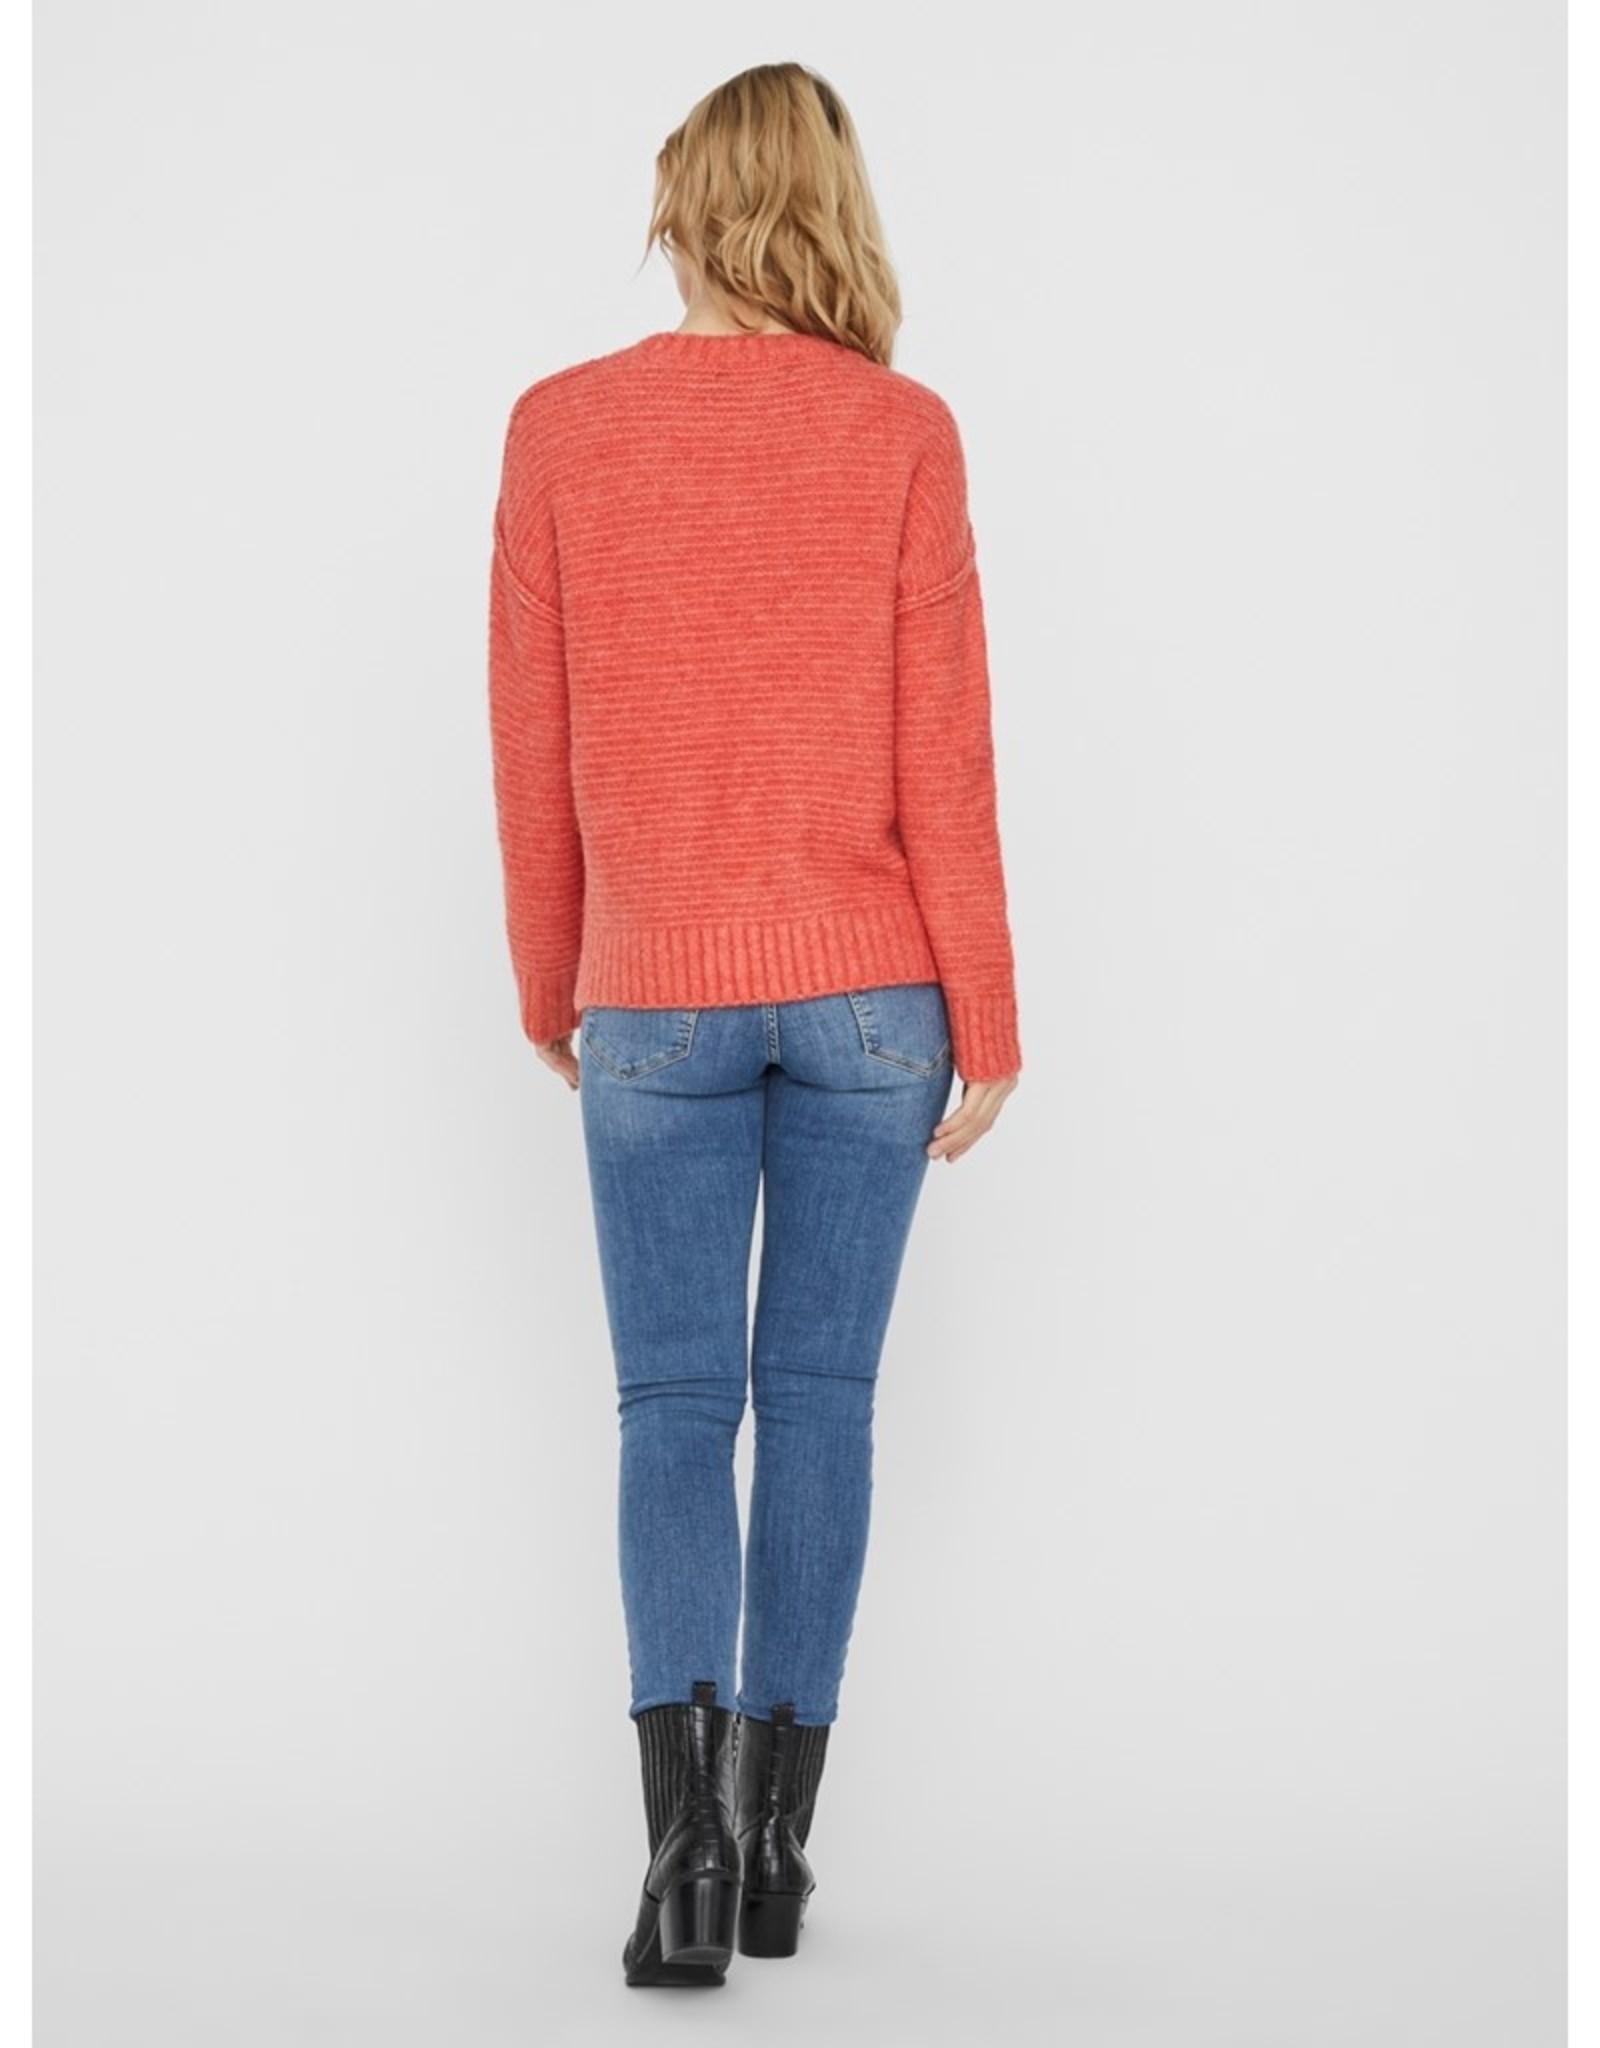 Vero Moda Jade Sweater